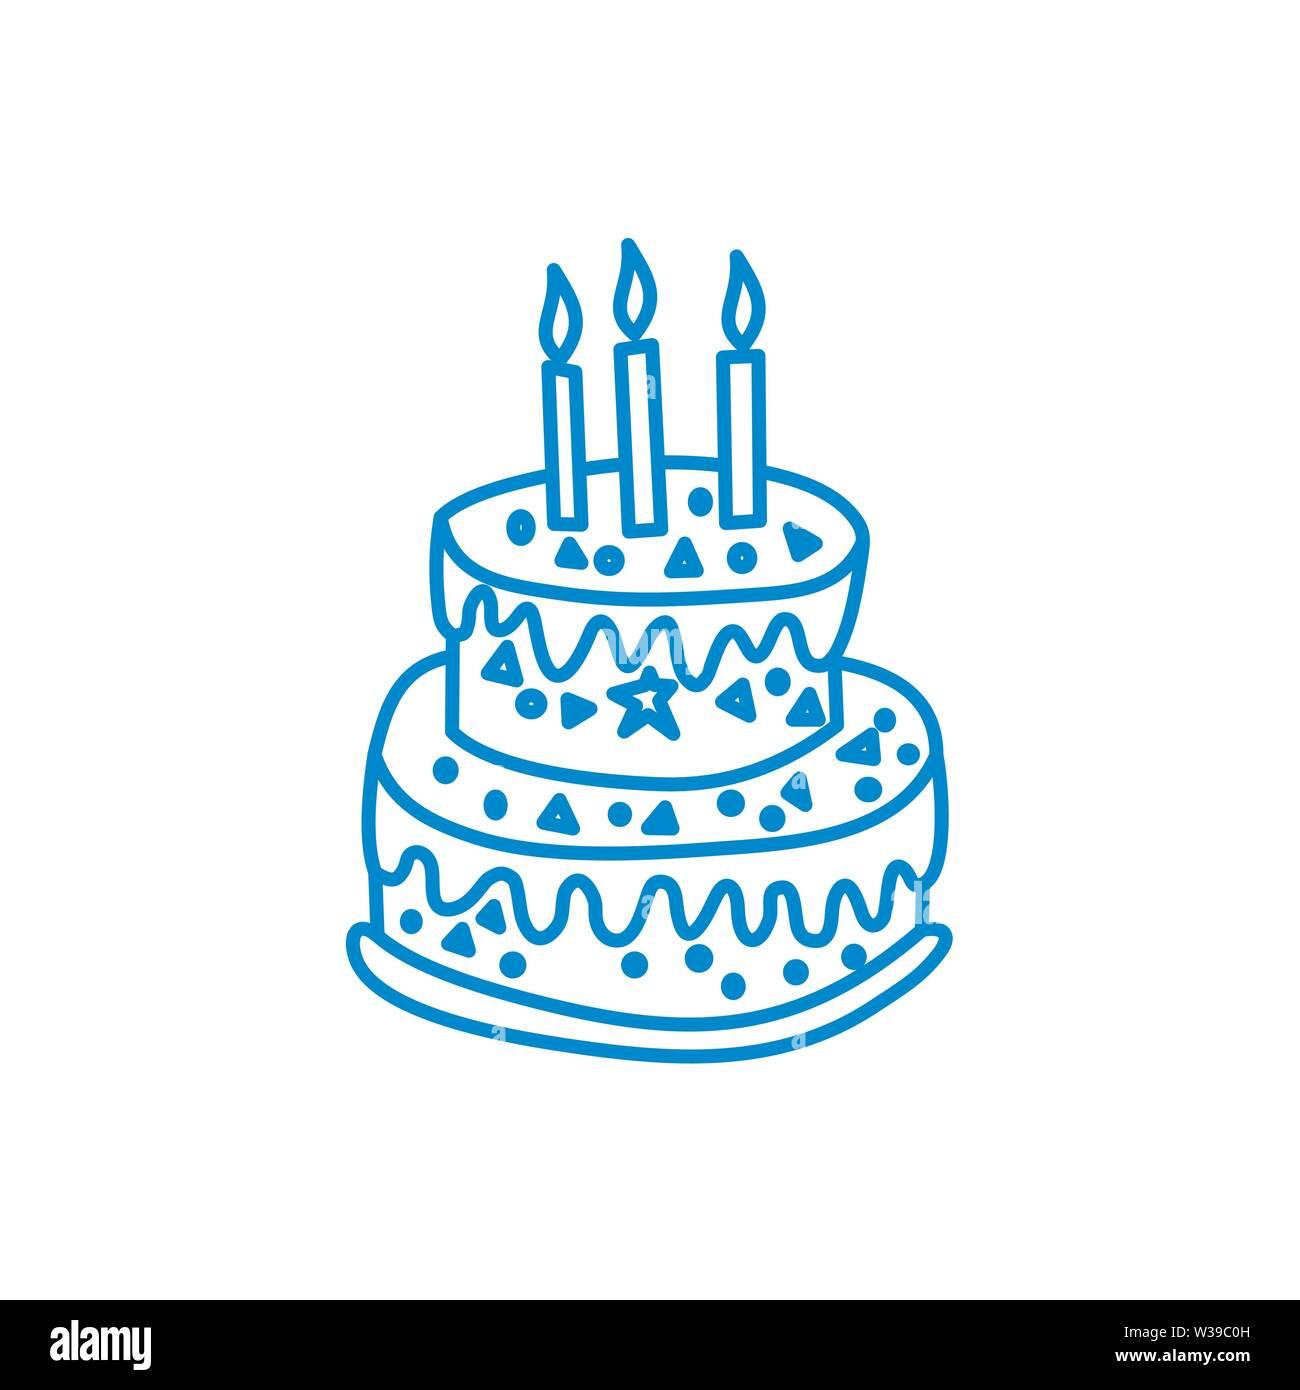 Terrific Cake Birthday Design Graphic Template Vector Stock Vector Art Funny Birthday Cards Online Inifodamsfinfo